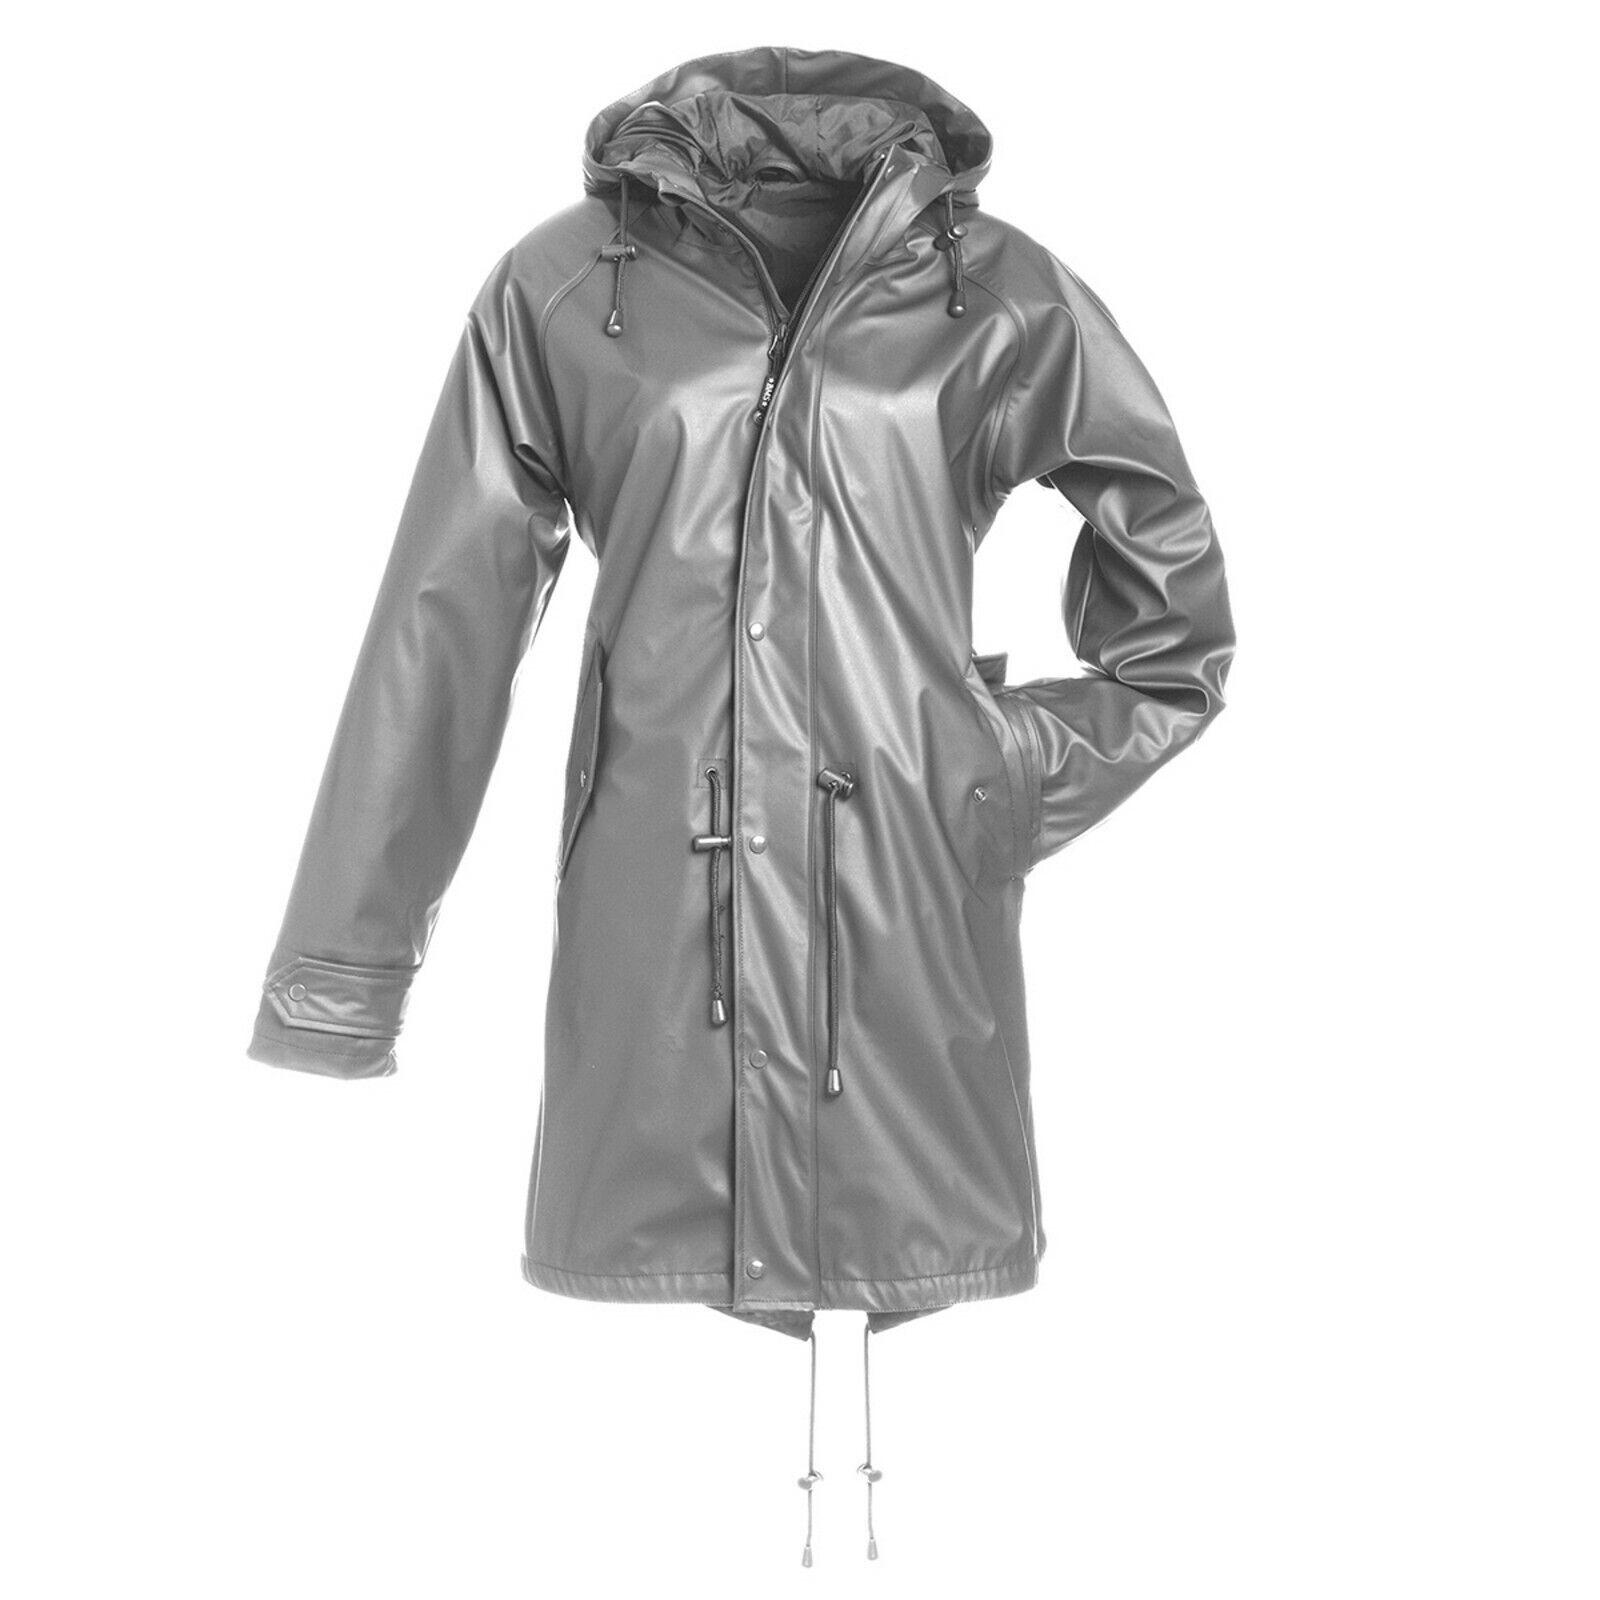 BMS HafenCity 50 Coat SoftSkin Friesennerz Regenmantel 100%wasserdicht grau grau